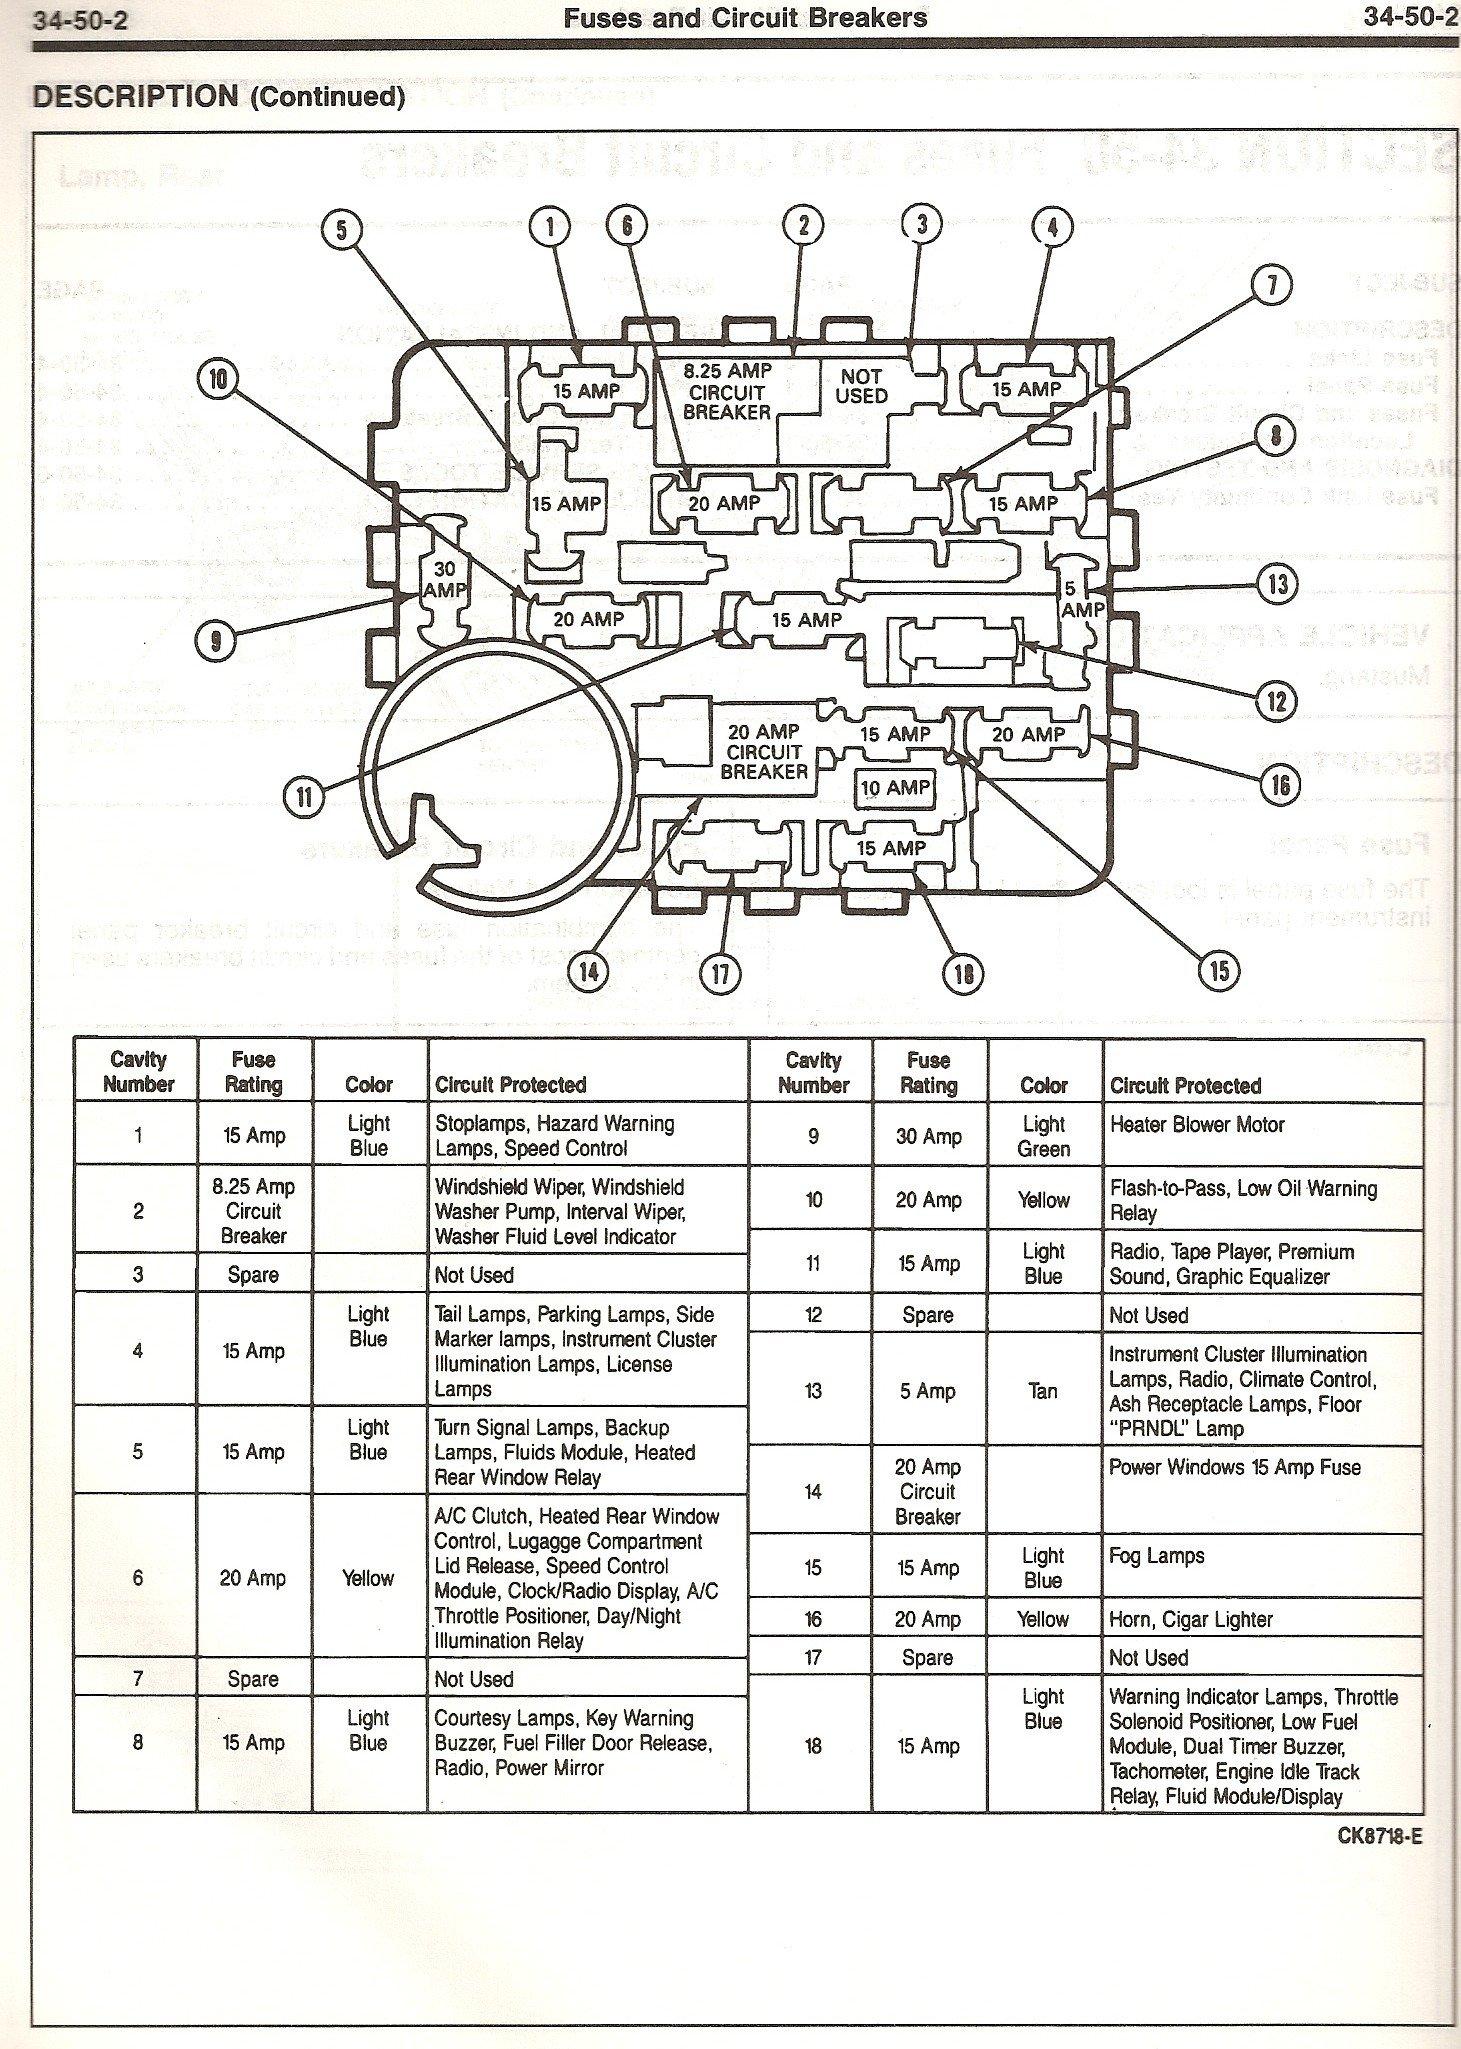 93 Explorer Fuse Box - Wiring Diagrams IMG gray - gray.farmaciastorelli.it